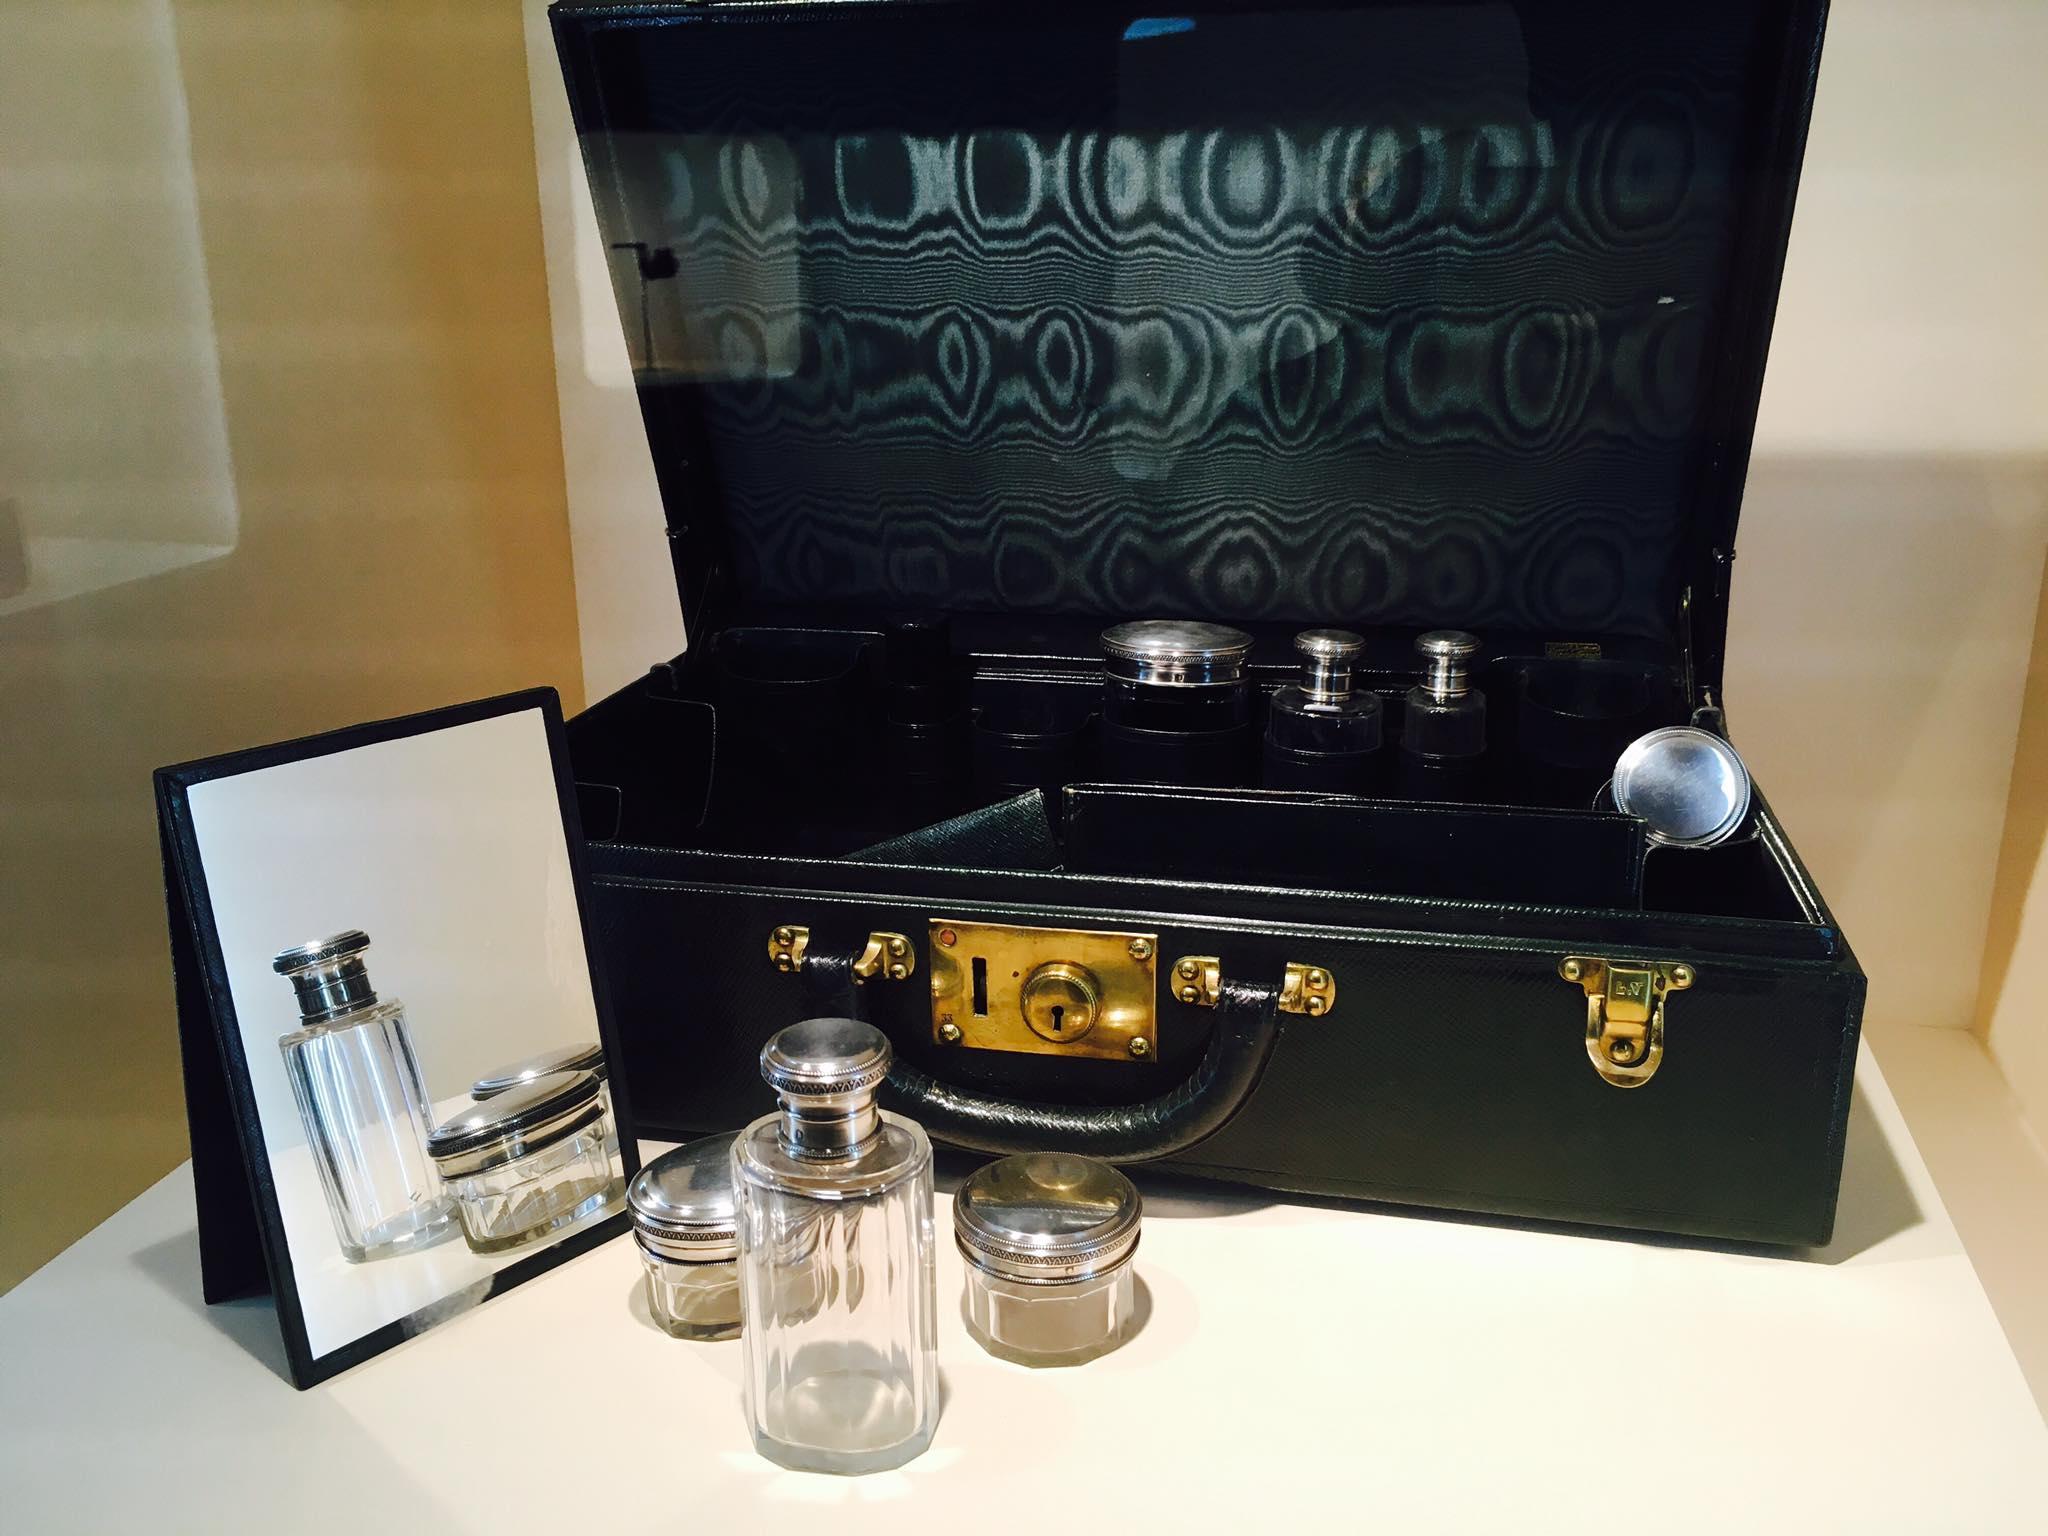 time Capsule Louis Vuitton koffert tilbehør